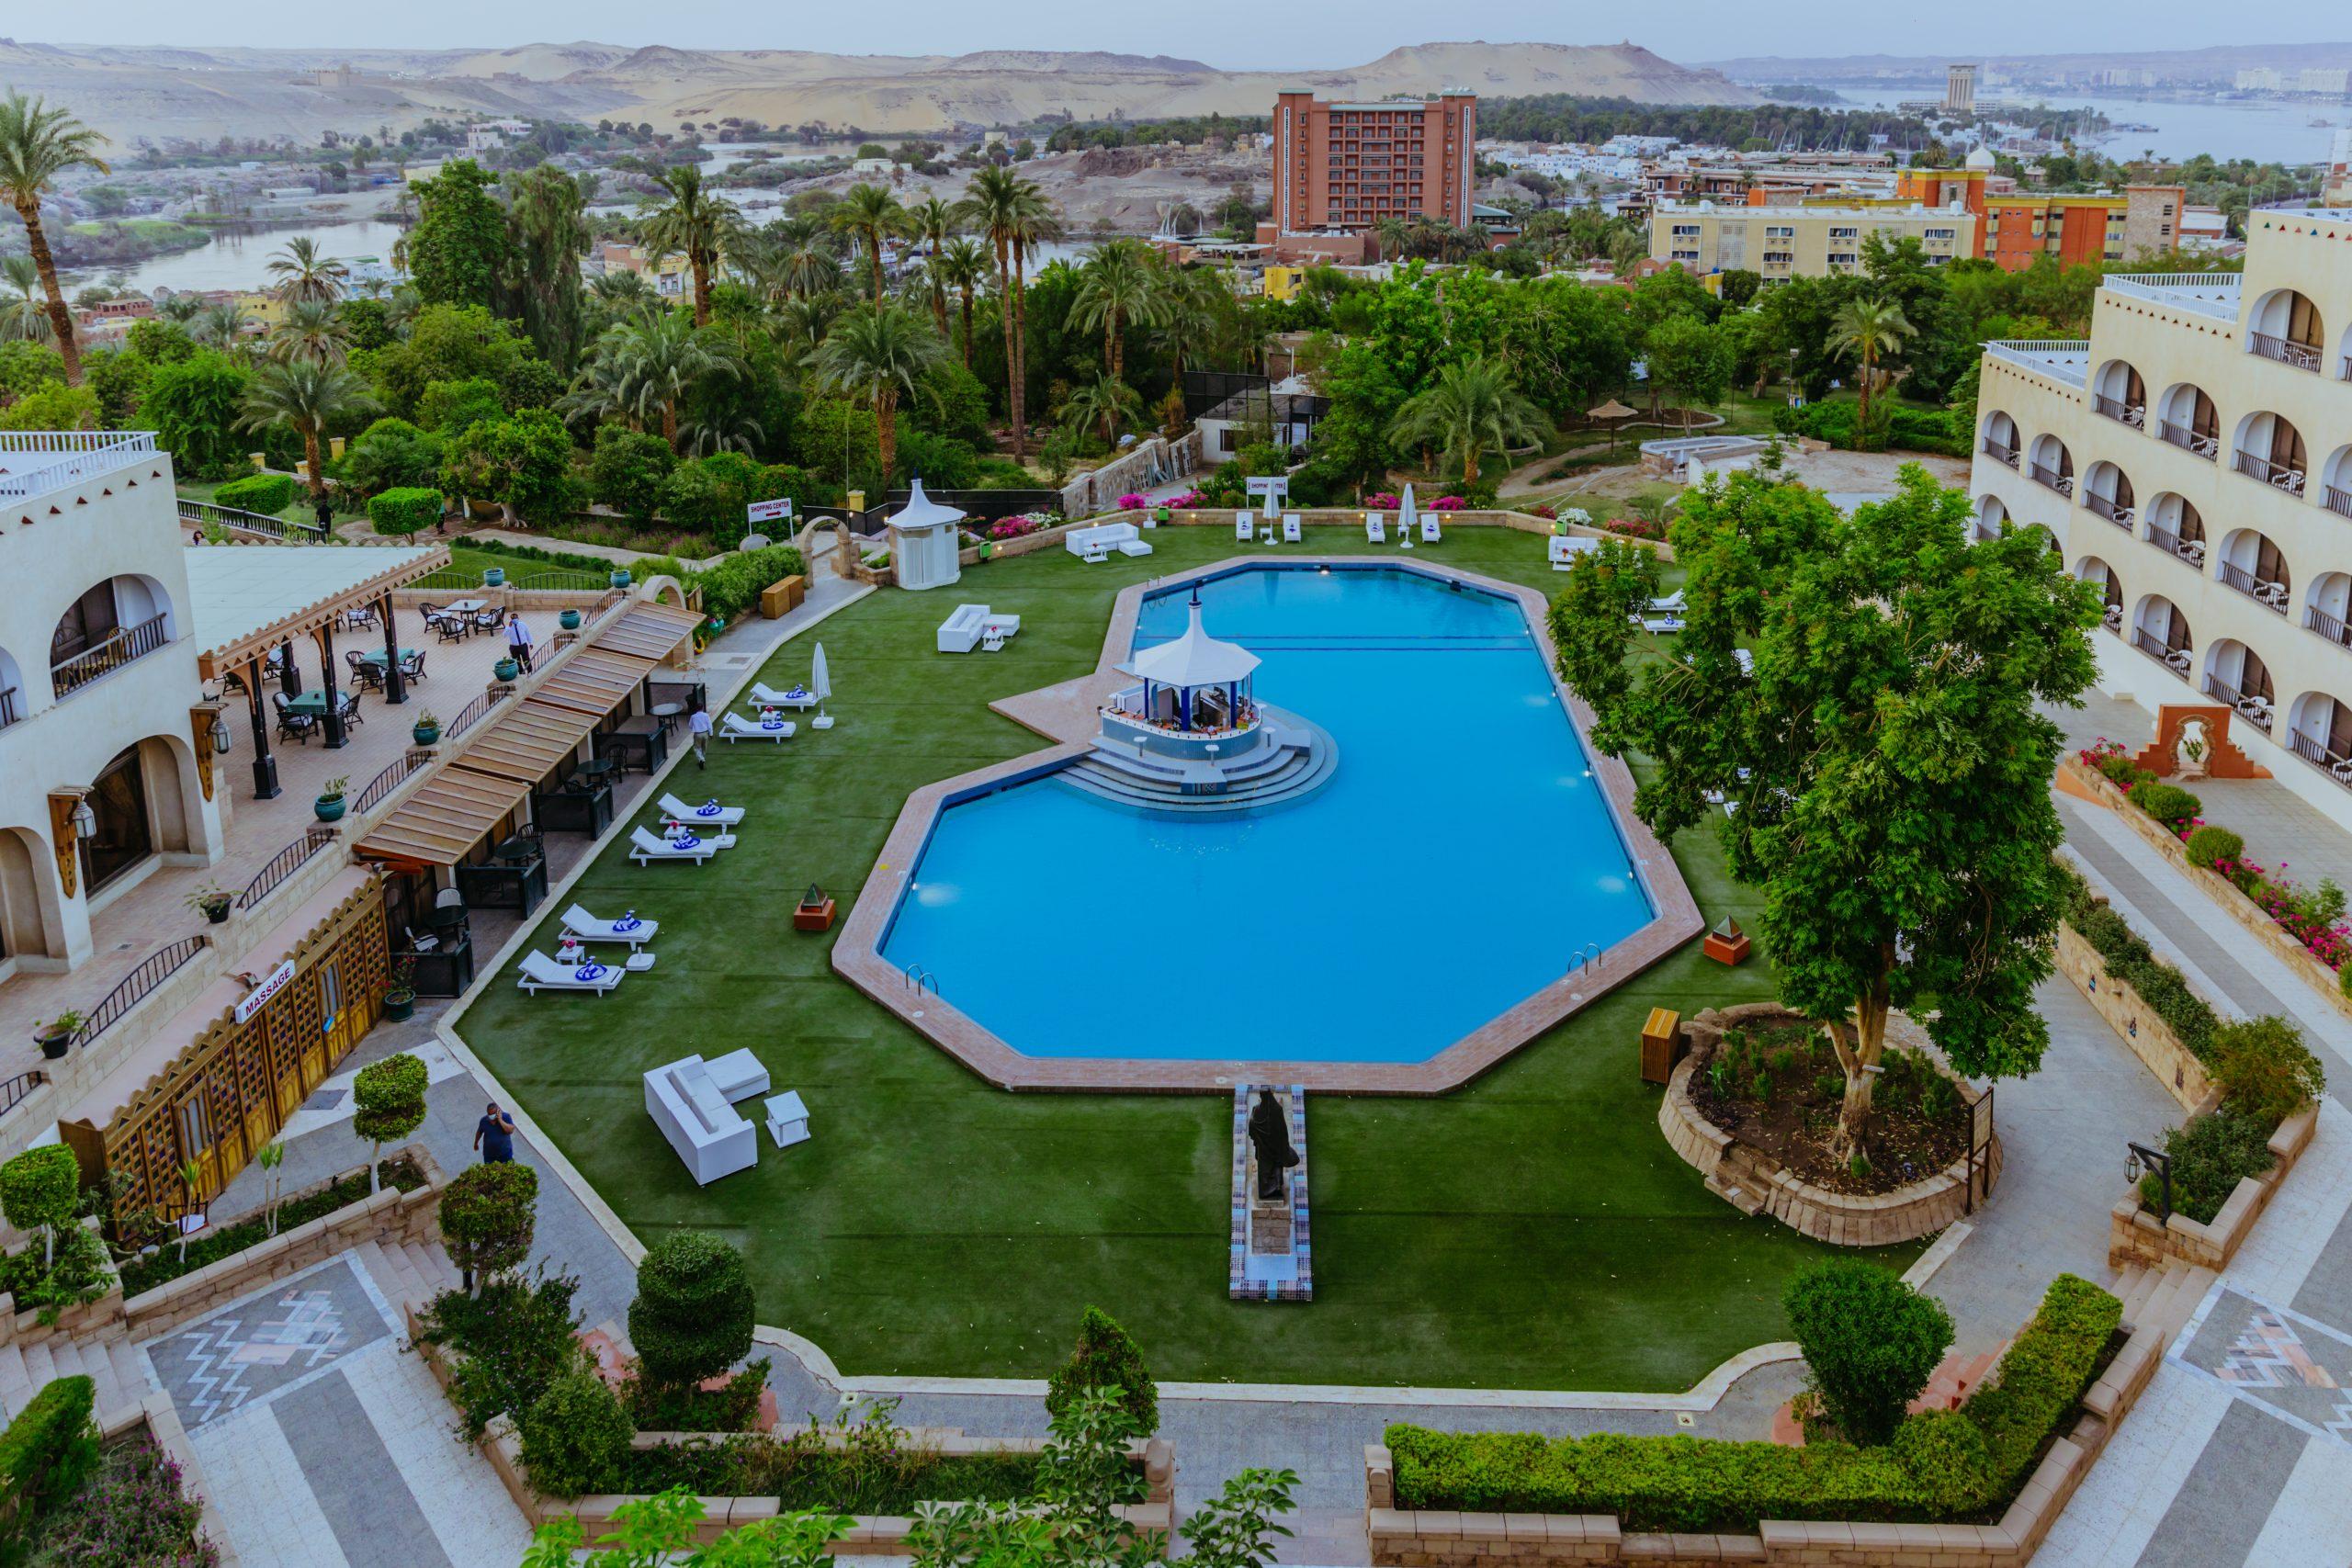 Hotel Pool and Landscape in Aswan | Basma Hotel